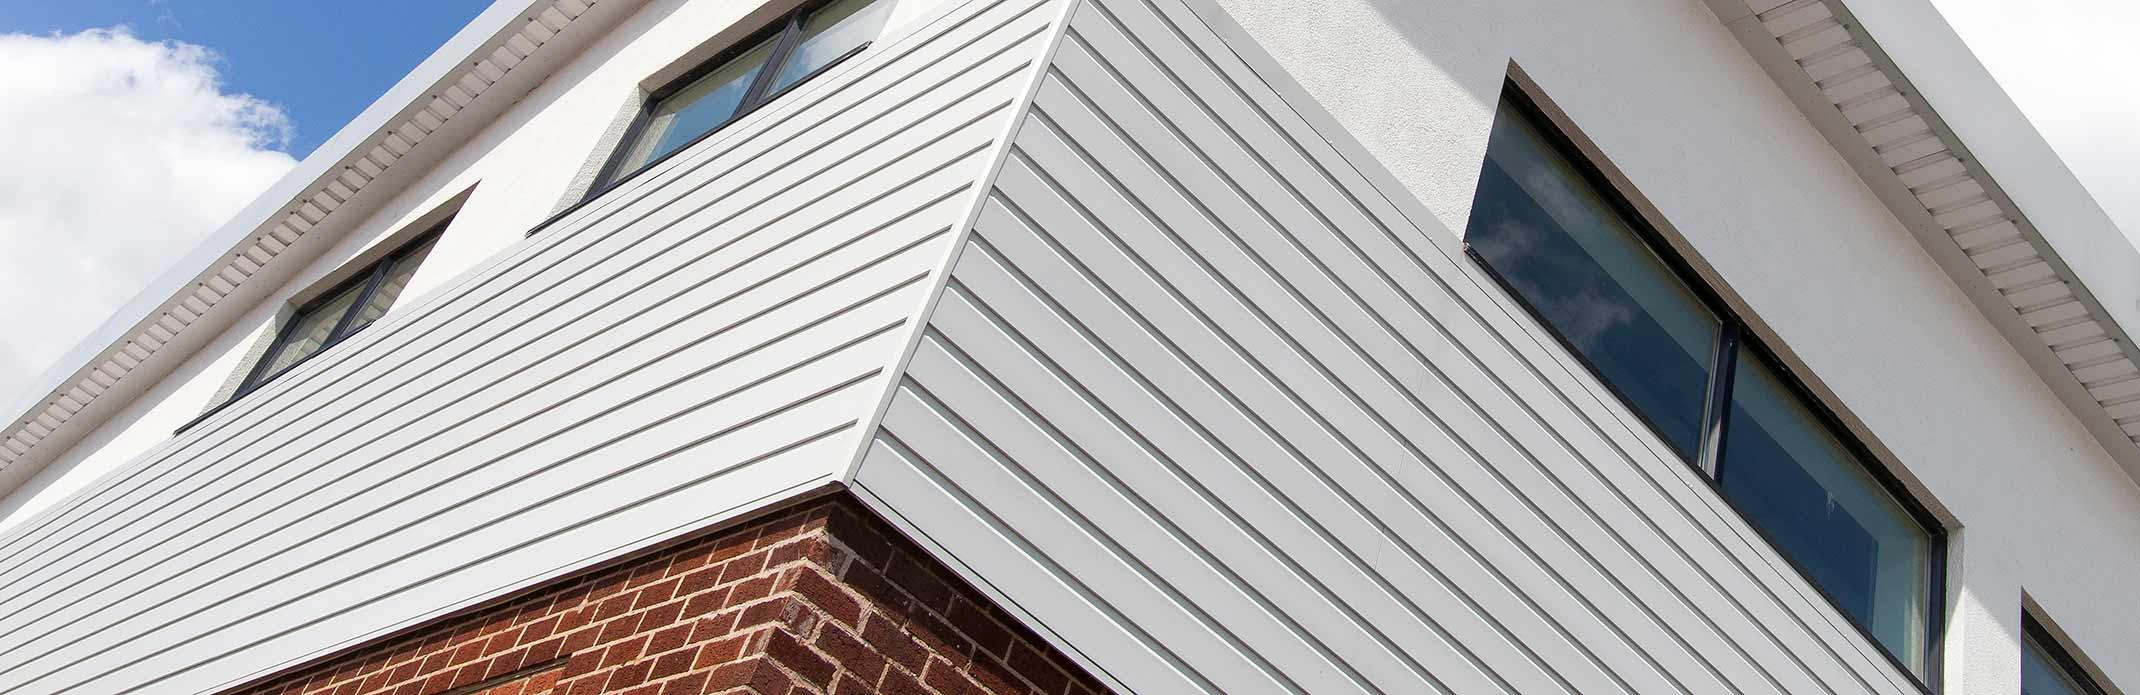 aluminium rainscreen cladding system